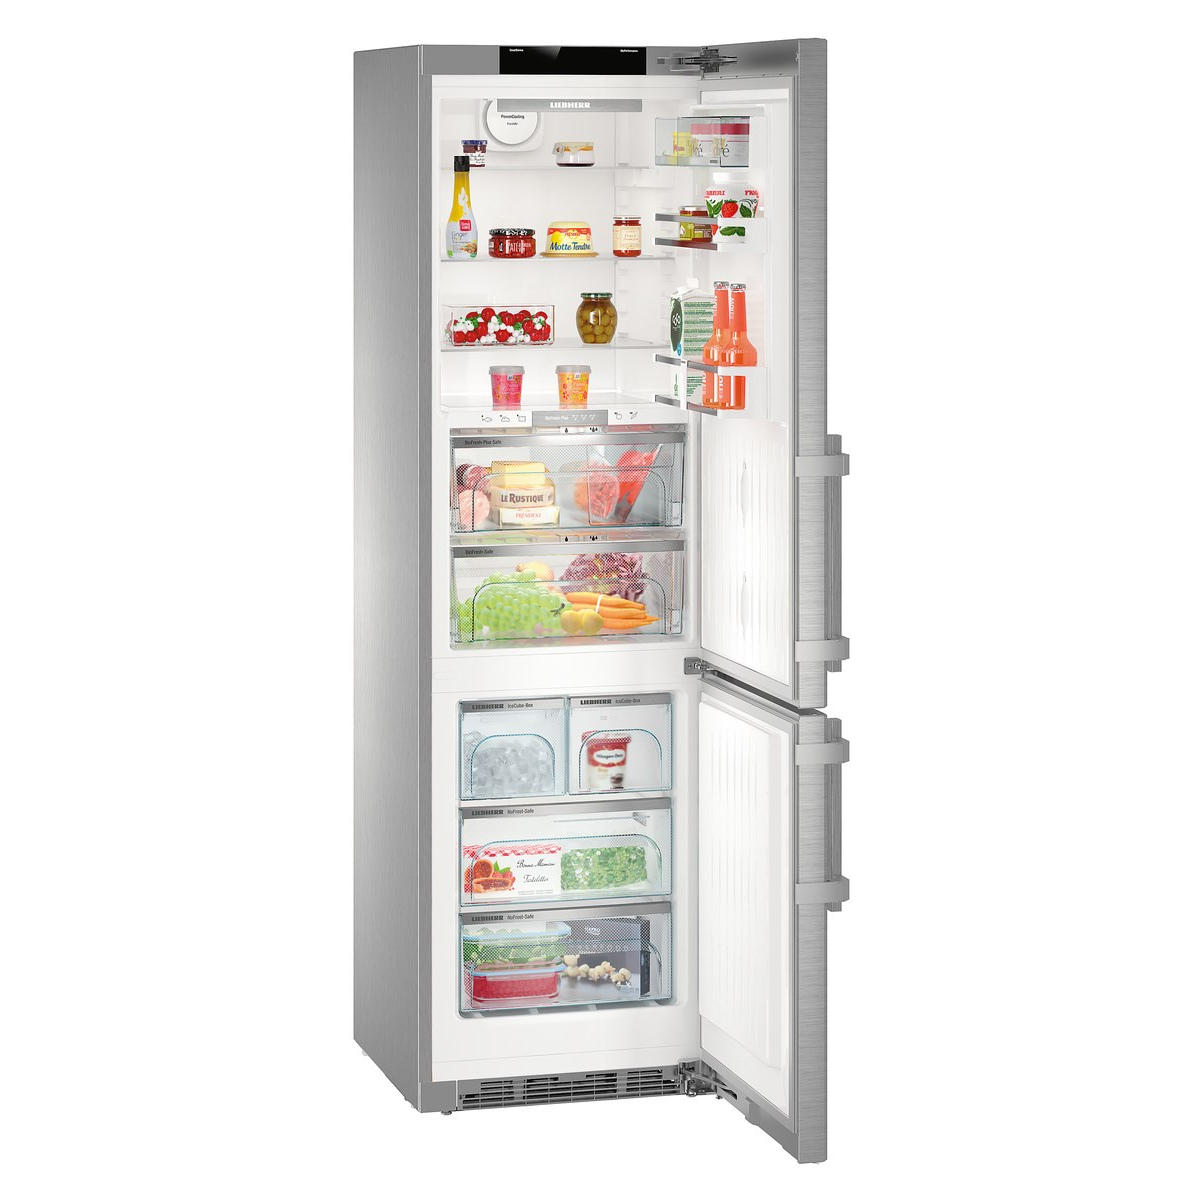 liebherr cbnpes 4878 premium biofresh nofrost fridge. Black Bedroom Furniture Sets. Home Design Ideas